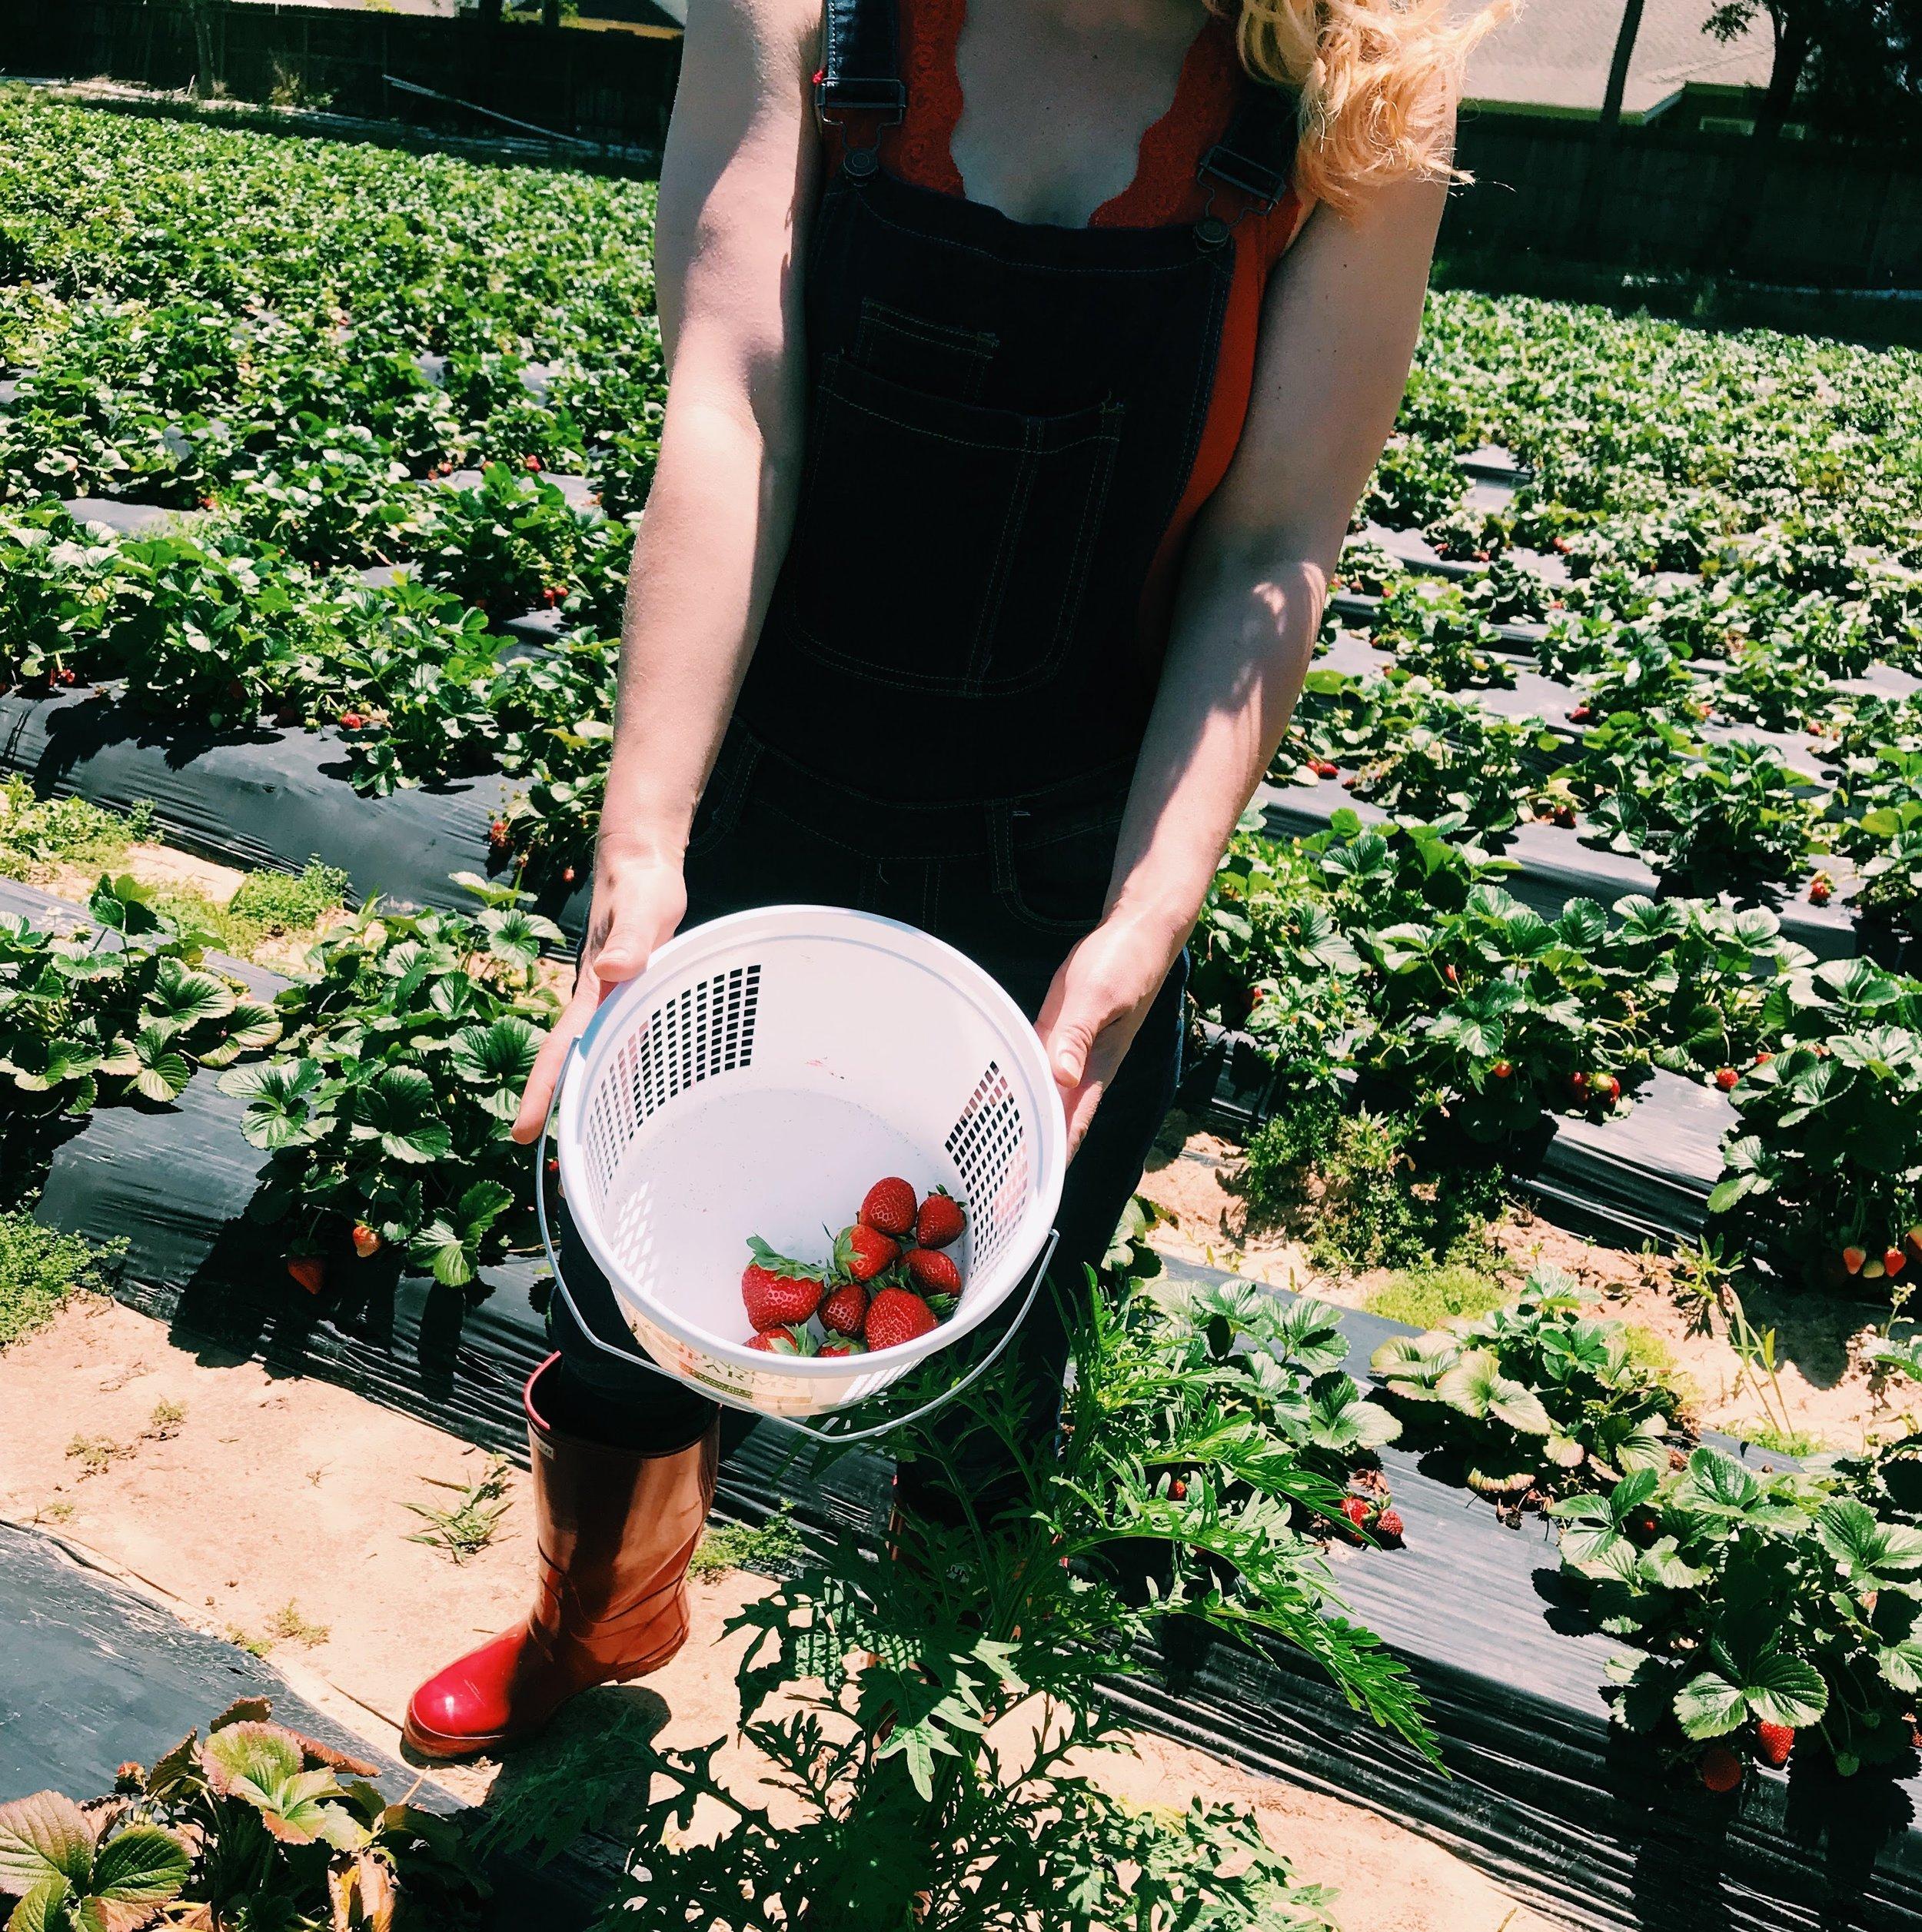 Three Heel Clicks - Strawberry Picking at Atkinson's Farms (5).jpg